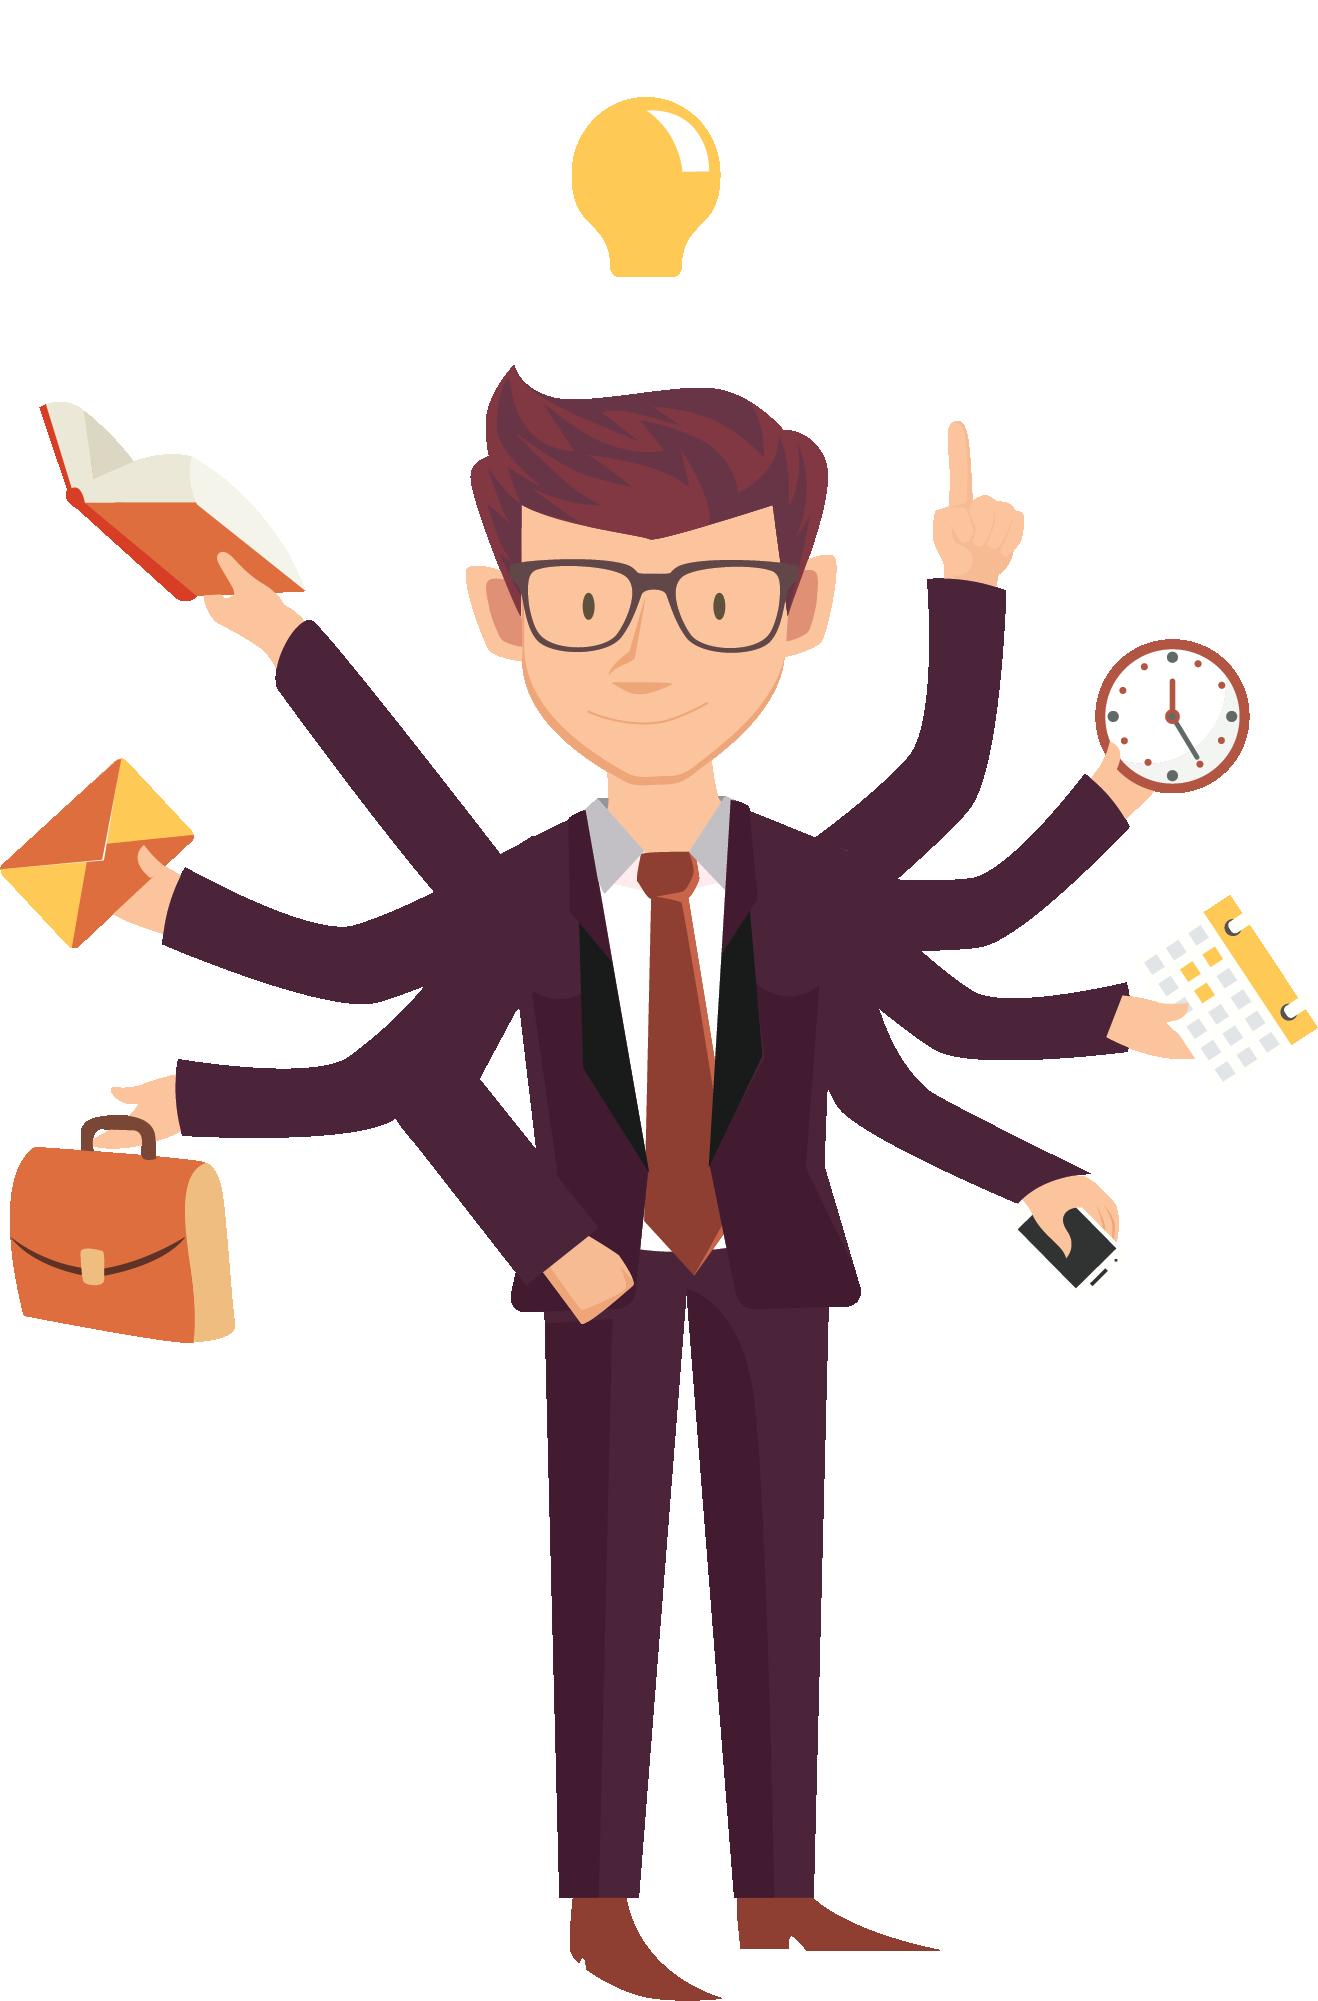 Busy Business People Entrepreneurship Job Employment Cartoon Business People Technology Design Graphic Cartoon